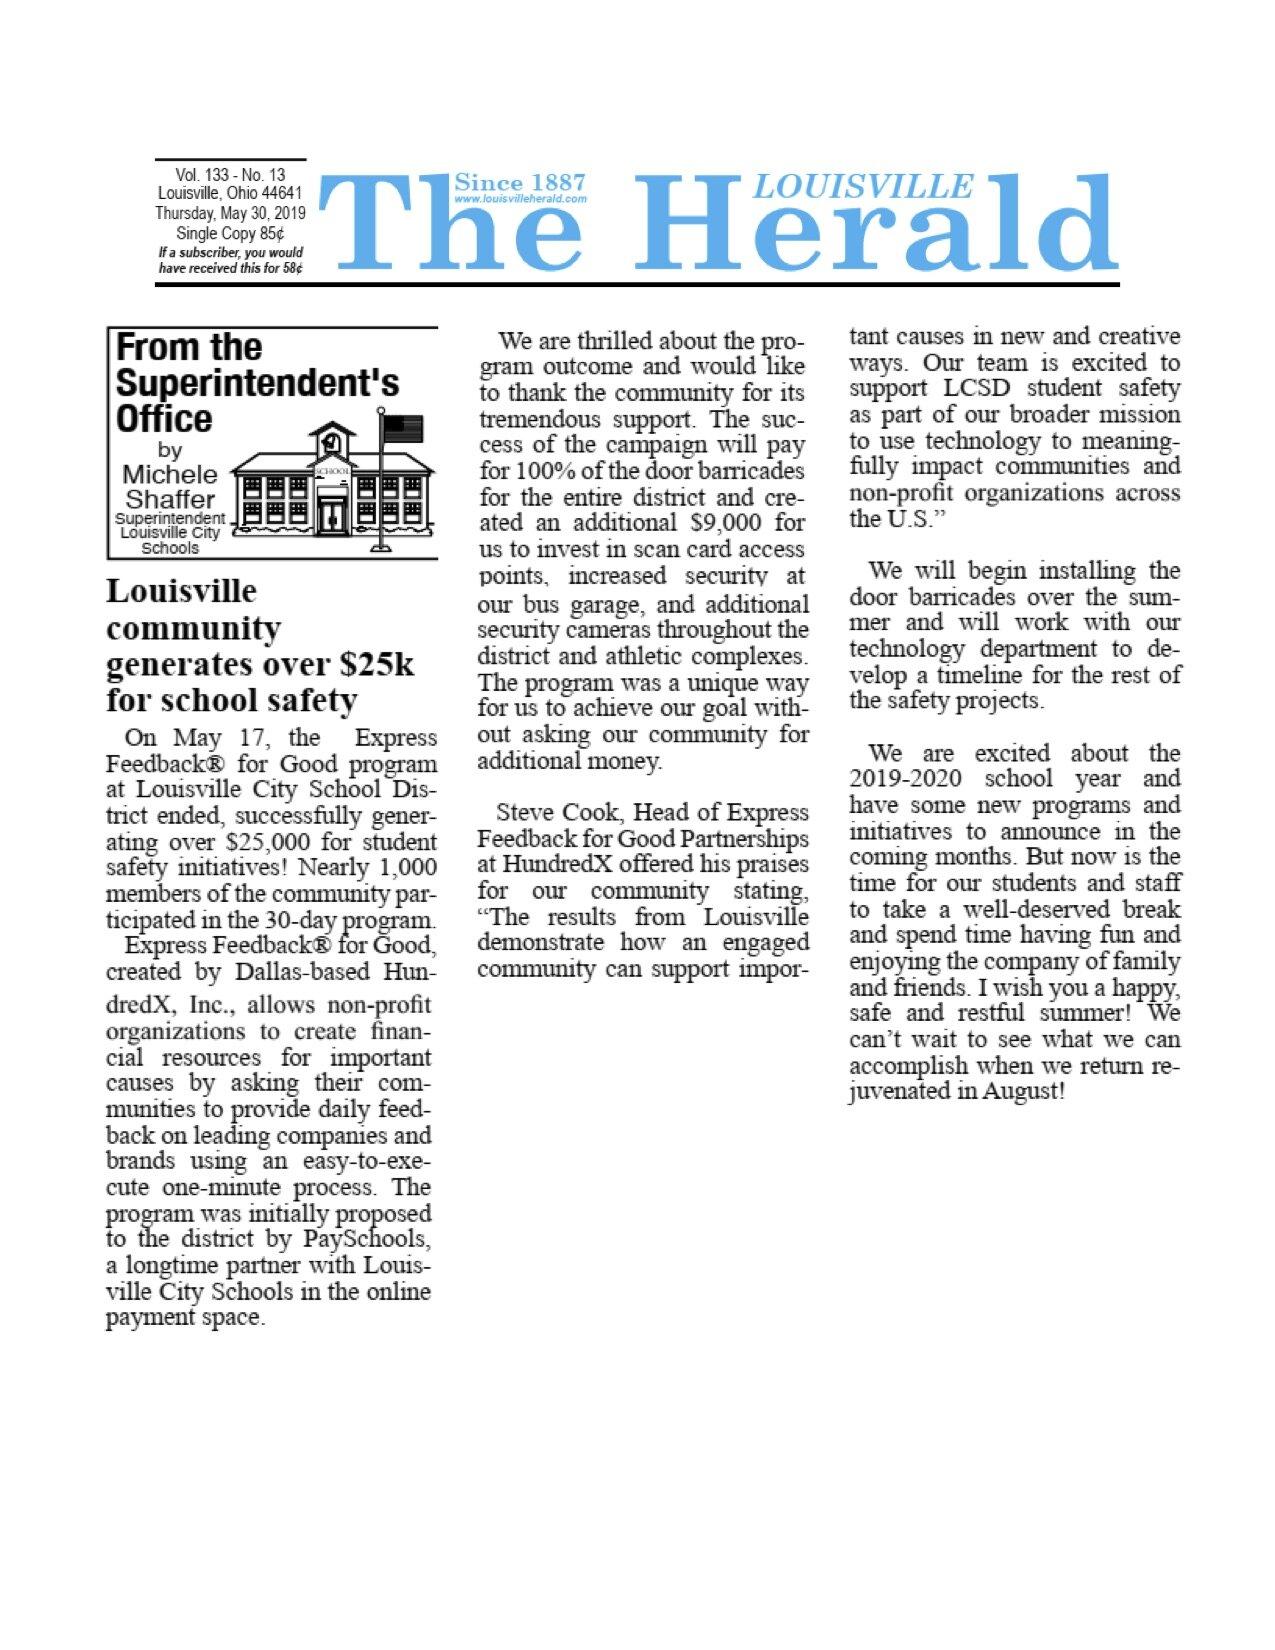 2019-05-30_Louisville+Herald-EFG+Article+vClean.jpg